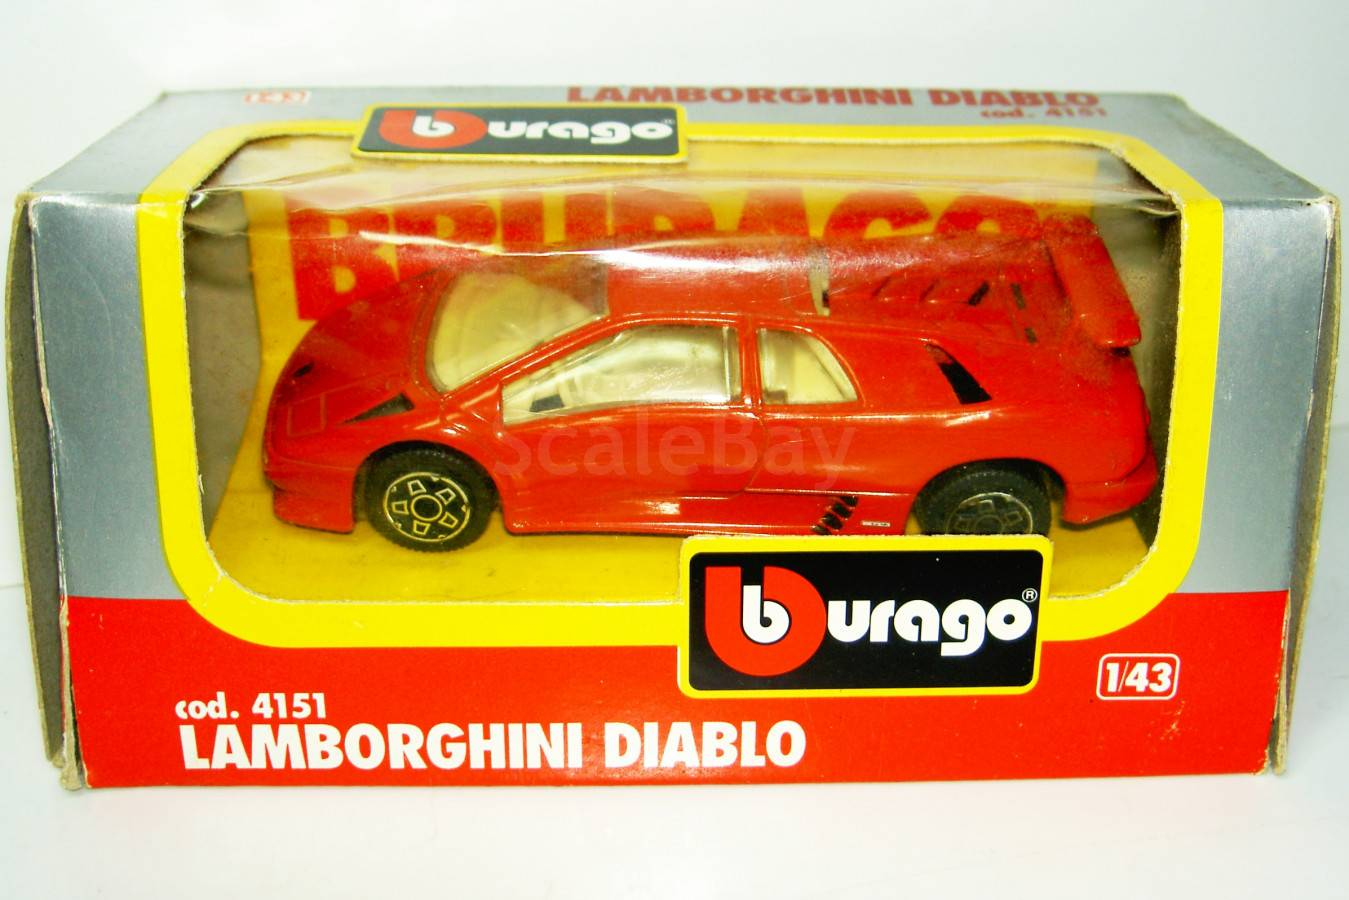 1 43 Lamborghini Diablo Bburago Aukcion Masshtabnyh I Sbornyh Modelej